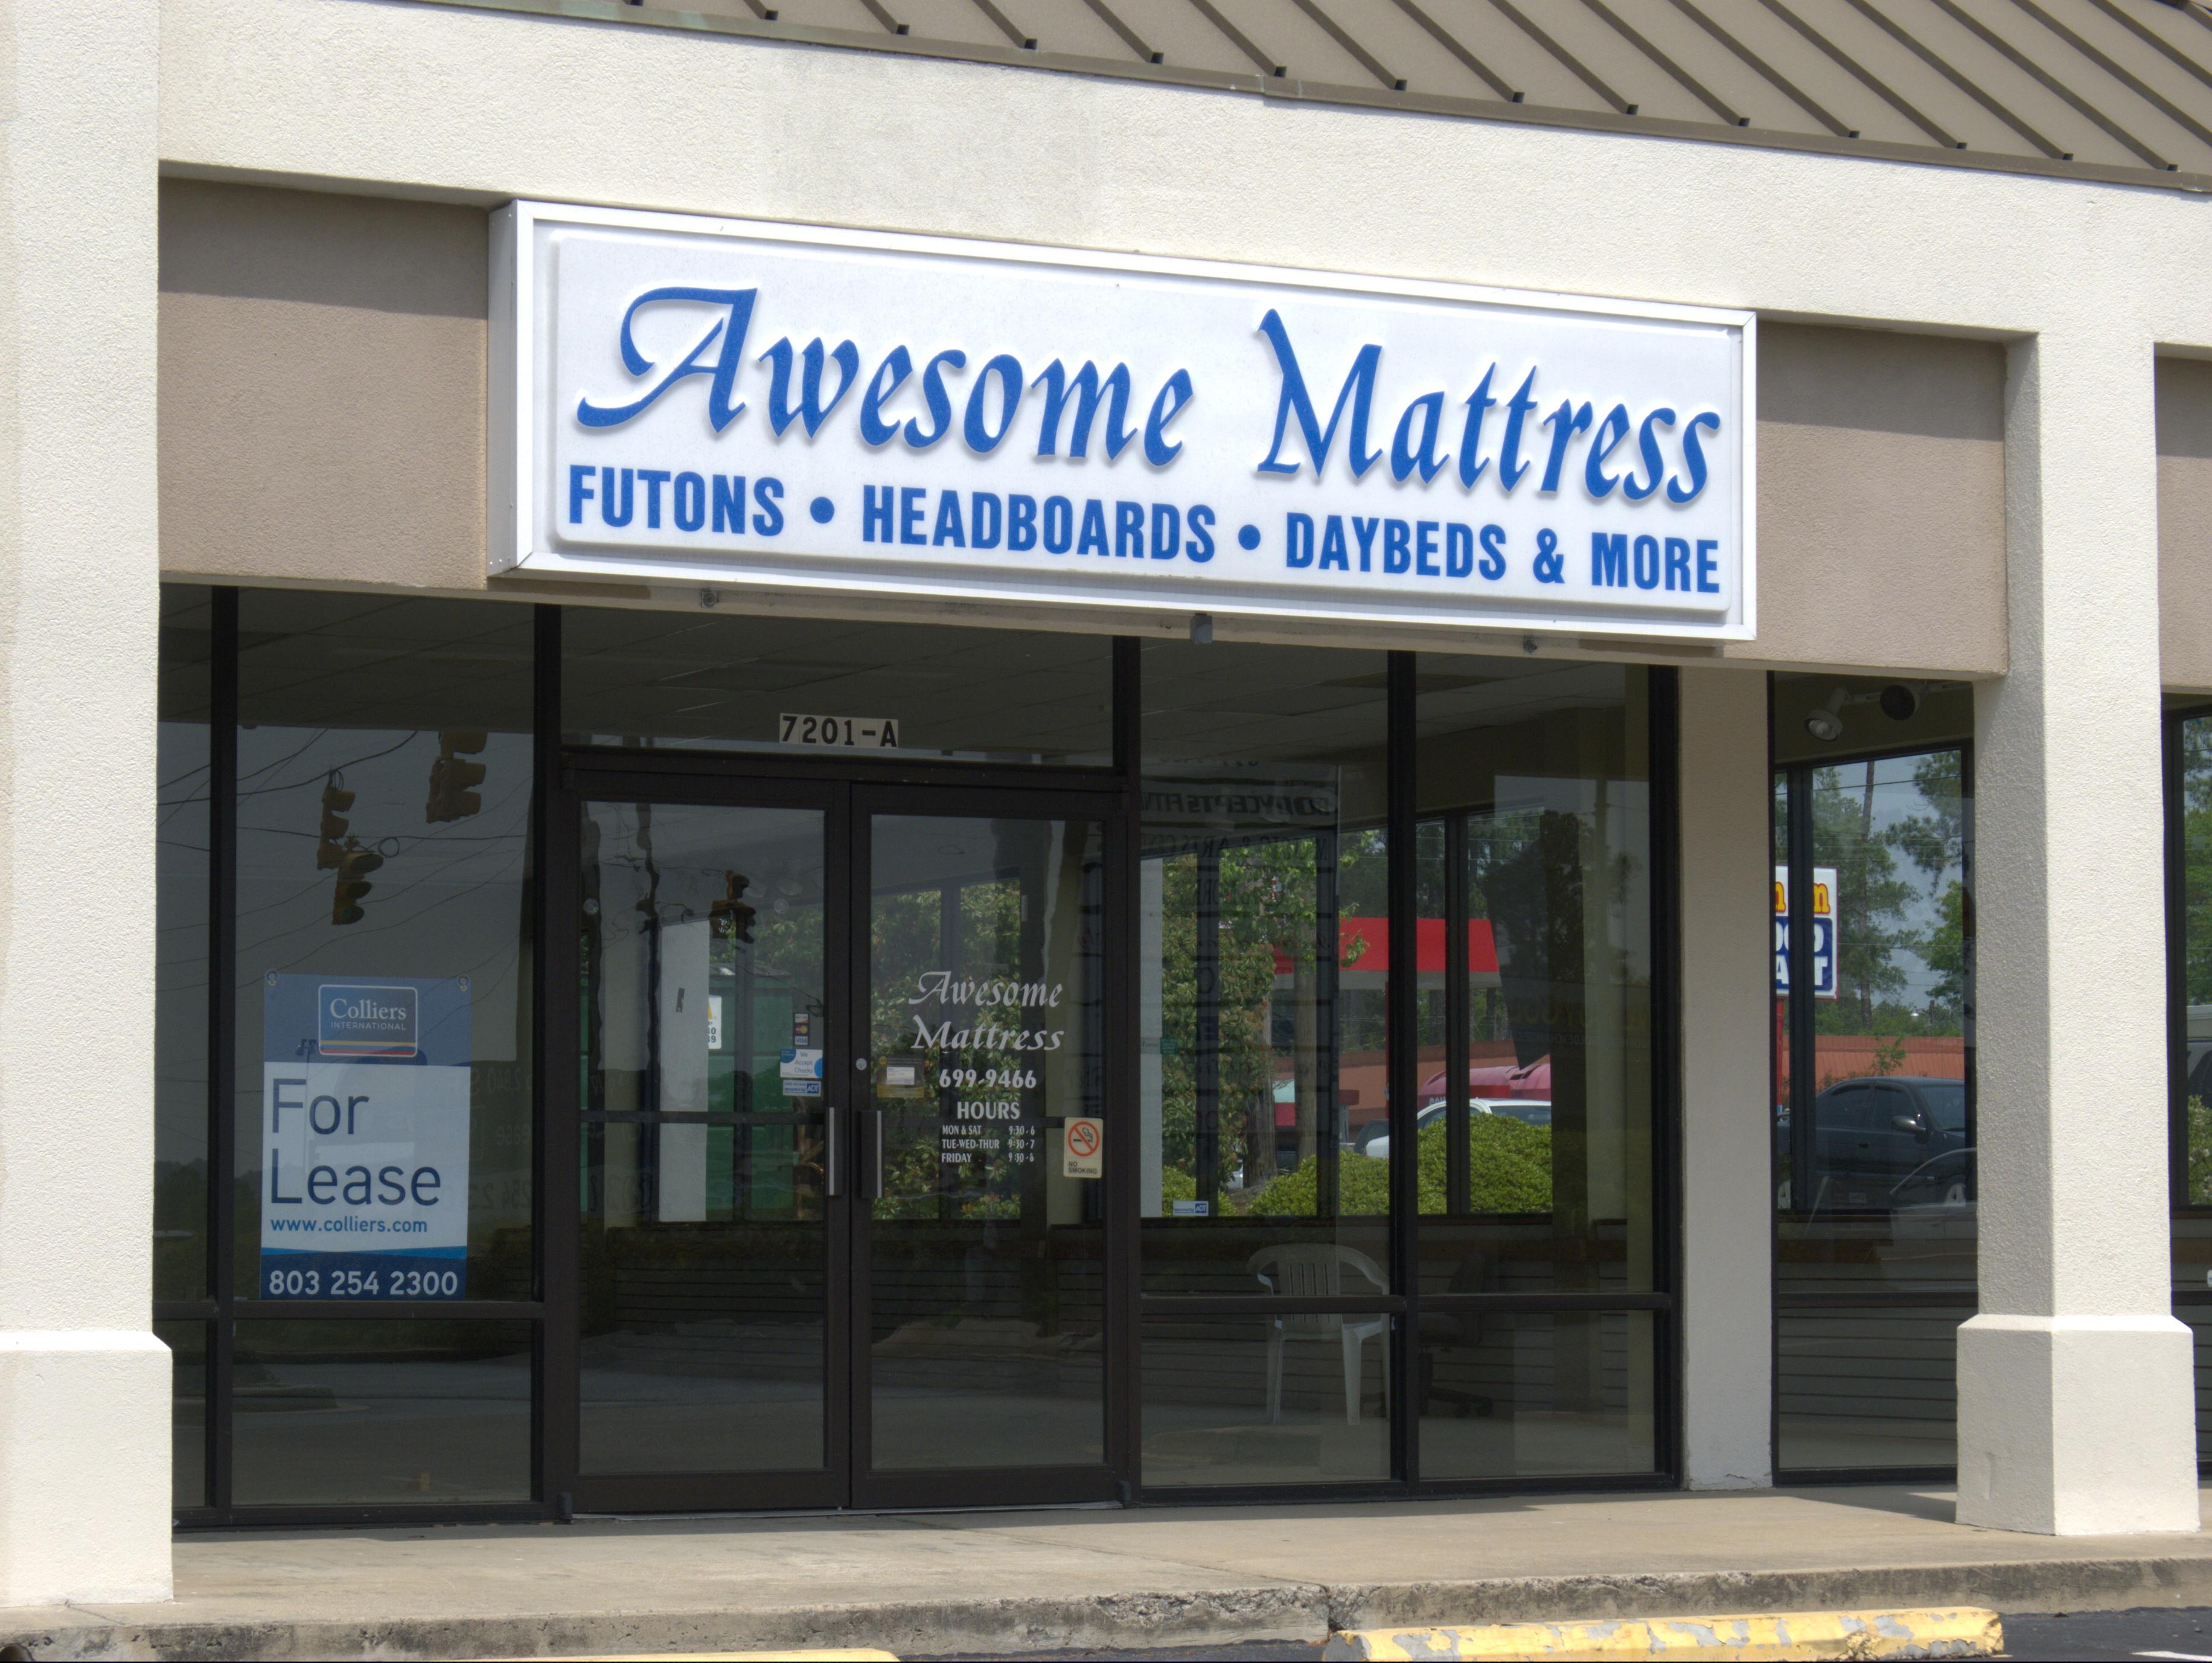 Awesome Mattress 7201 Parklane Road 2011 at Columbia Closings